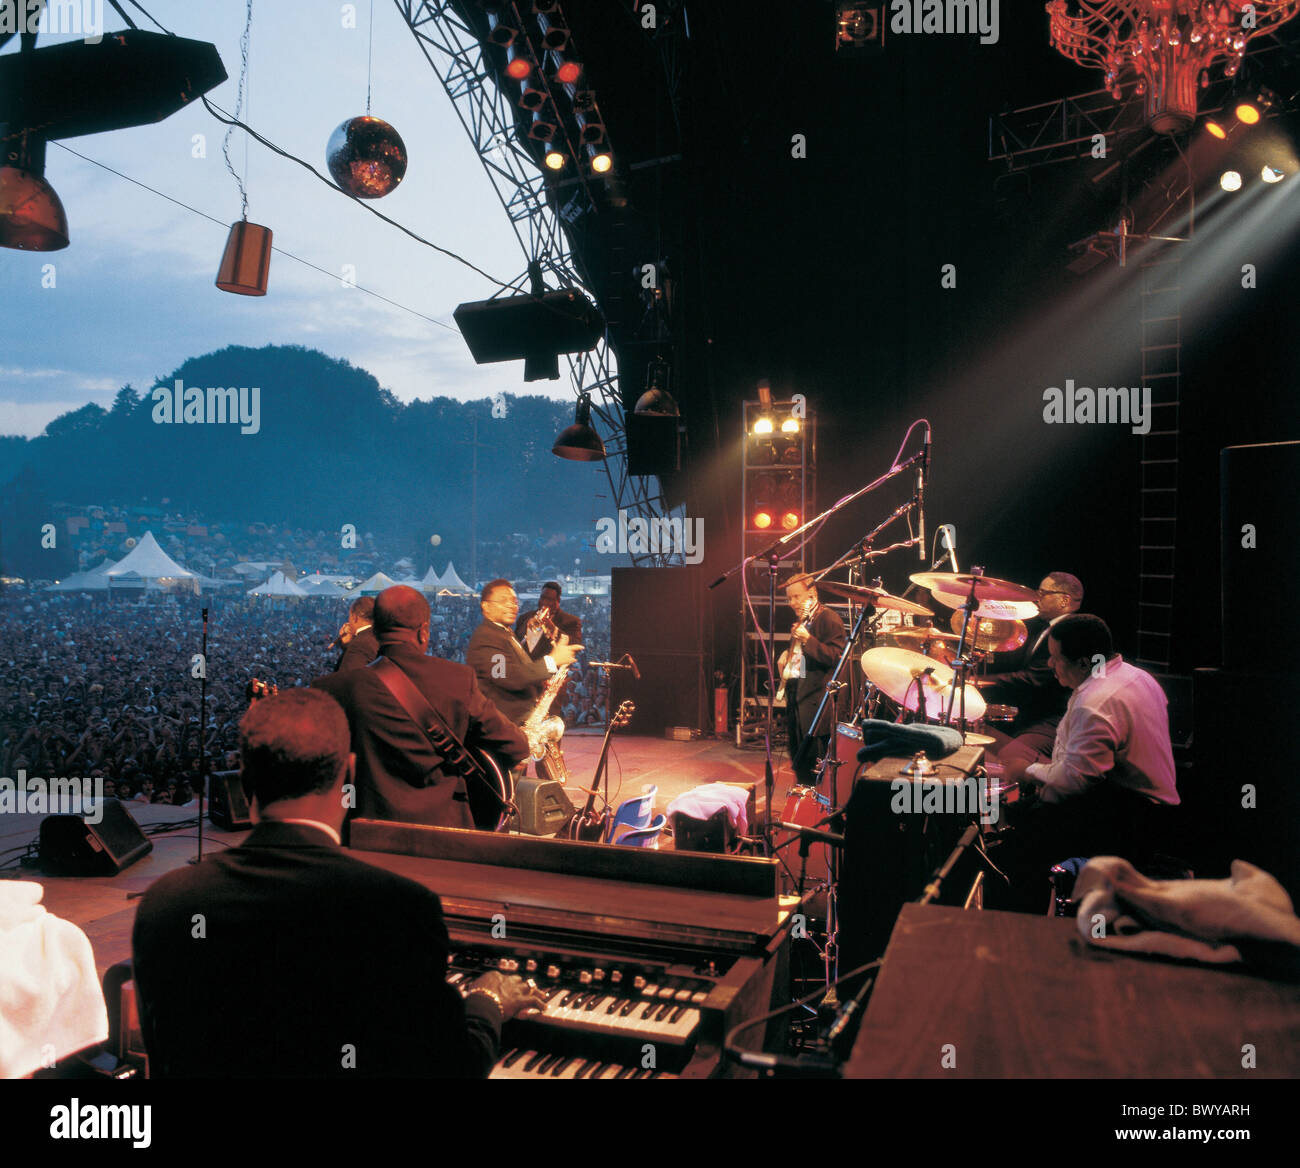 arrangement concert festival music no model release Open Air St. Gallen open air spectators stage Switzerla - Stock Image